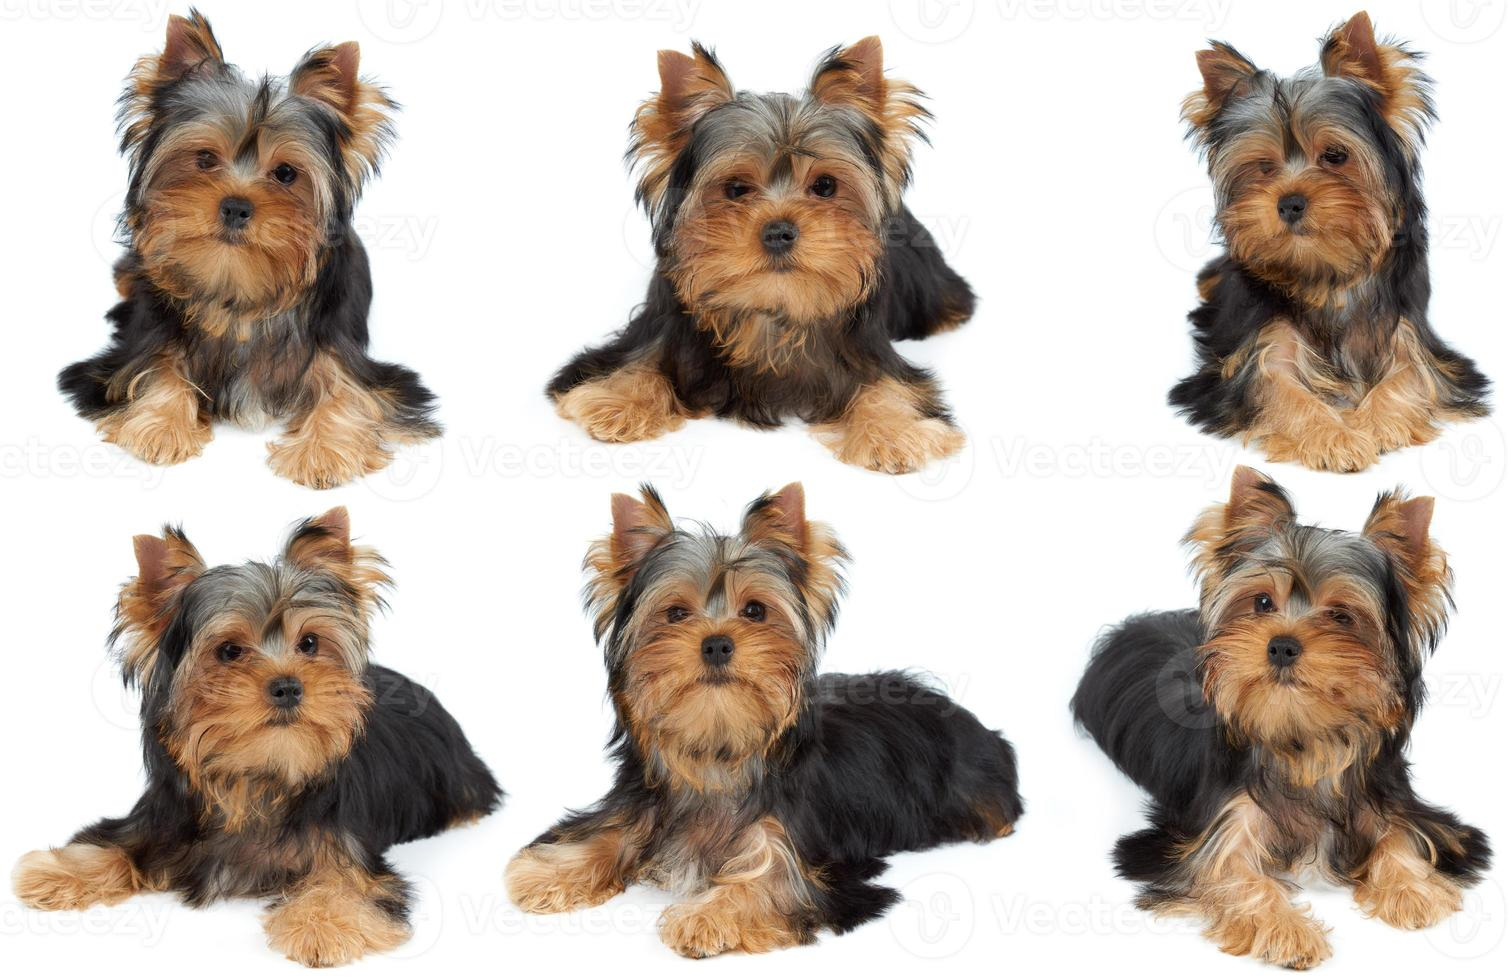 en fotosession av hunden foto